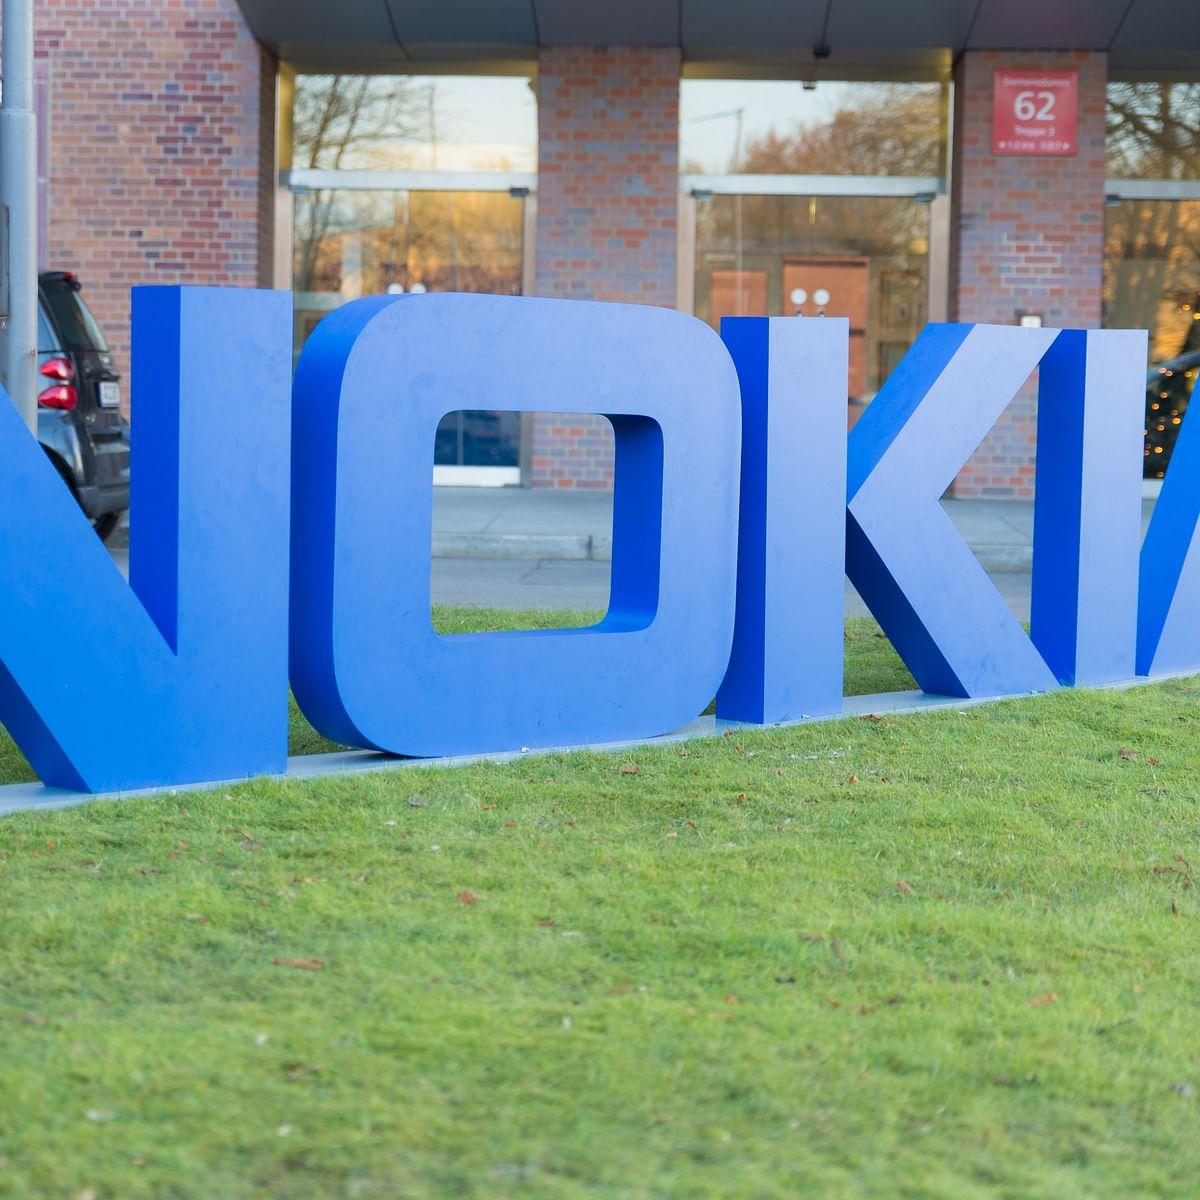 Nokia to cut up to 10,000 jobs to ramp up R&D in 5G race